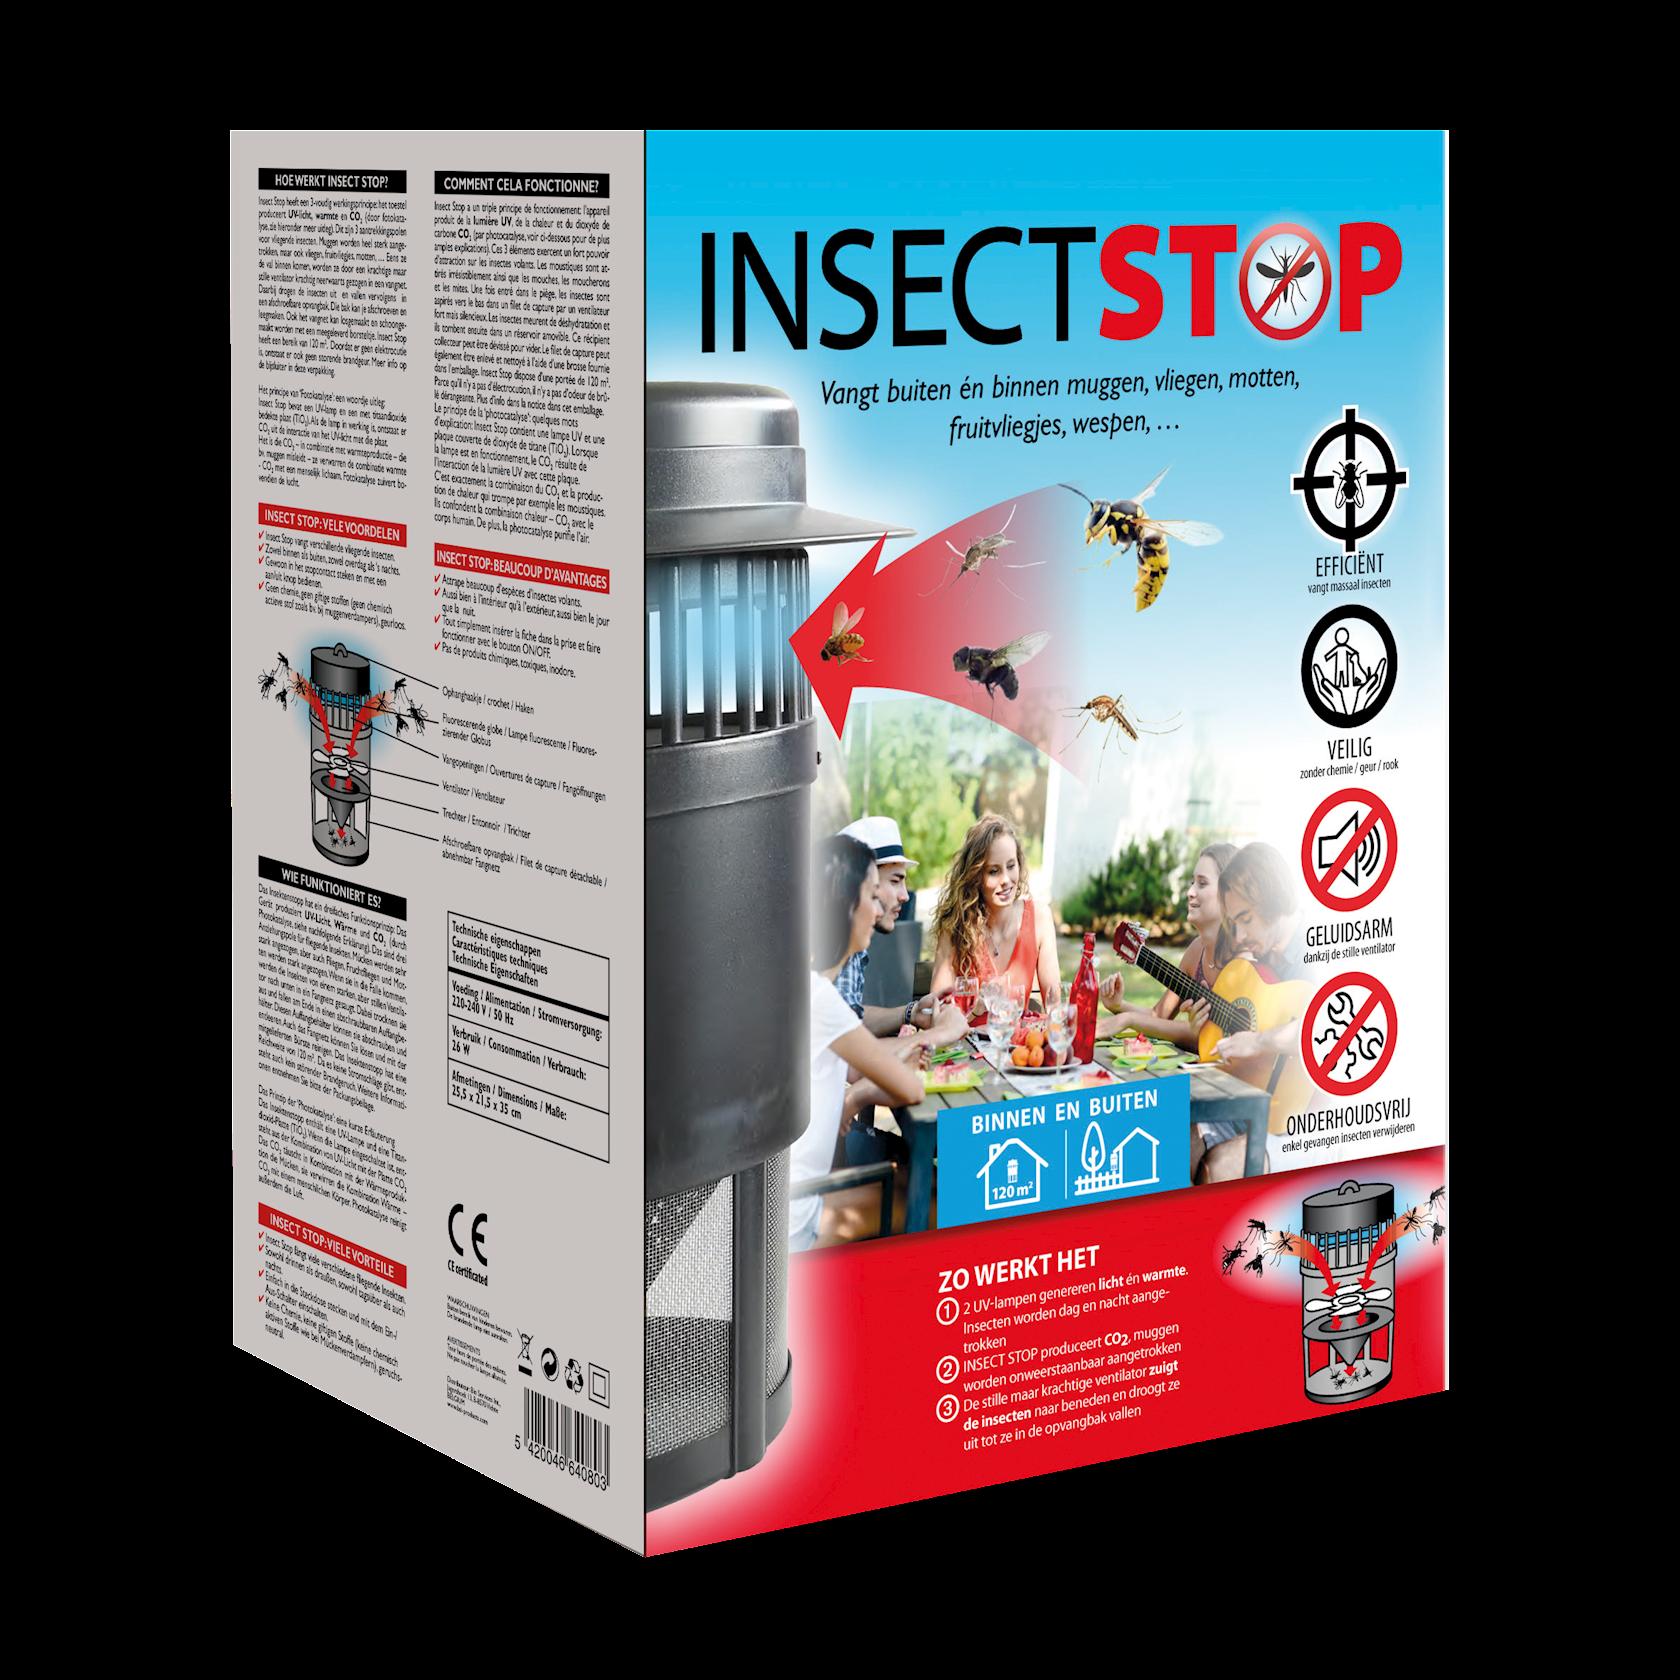 Insect stop tegen muggen, vliegen, fruitvliegen, motten,…